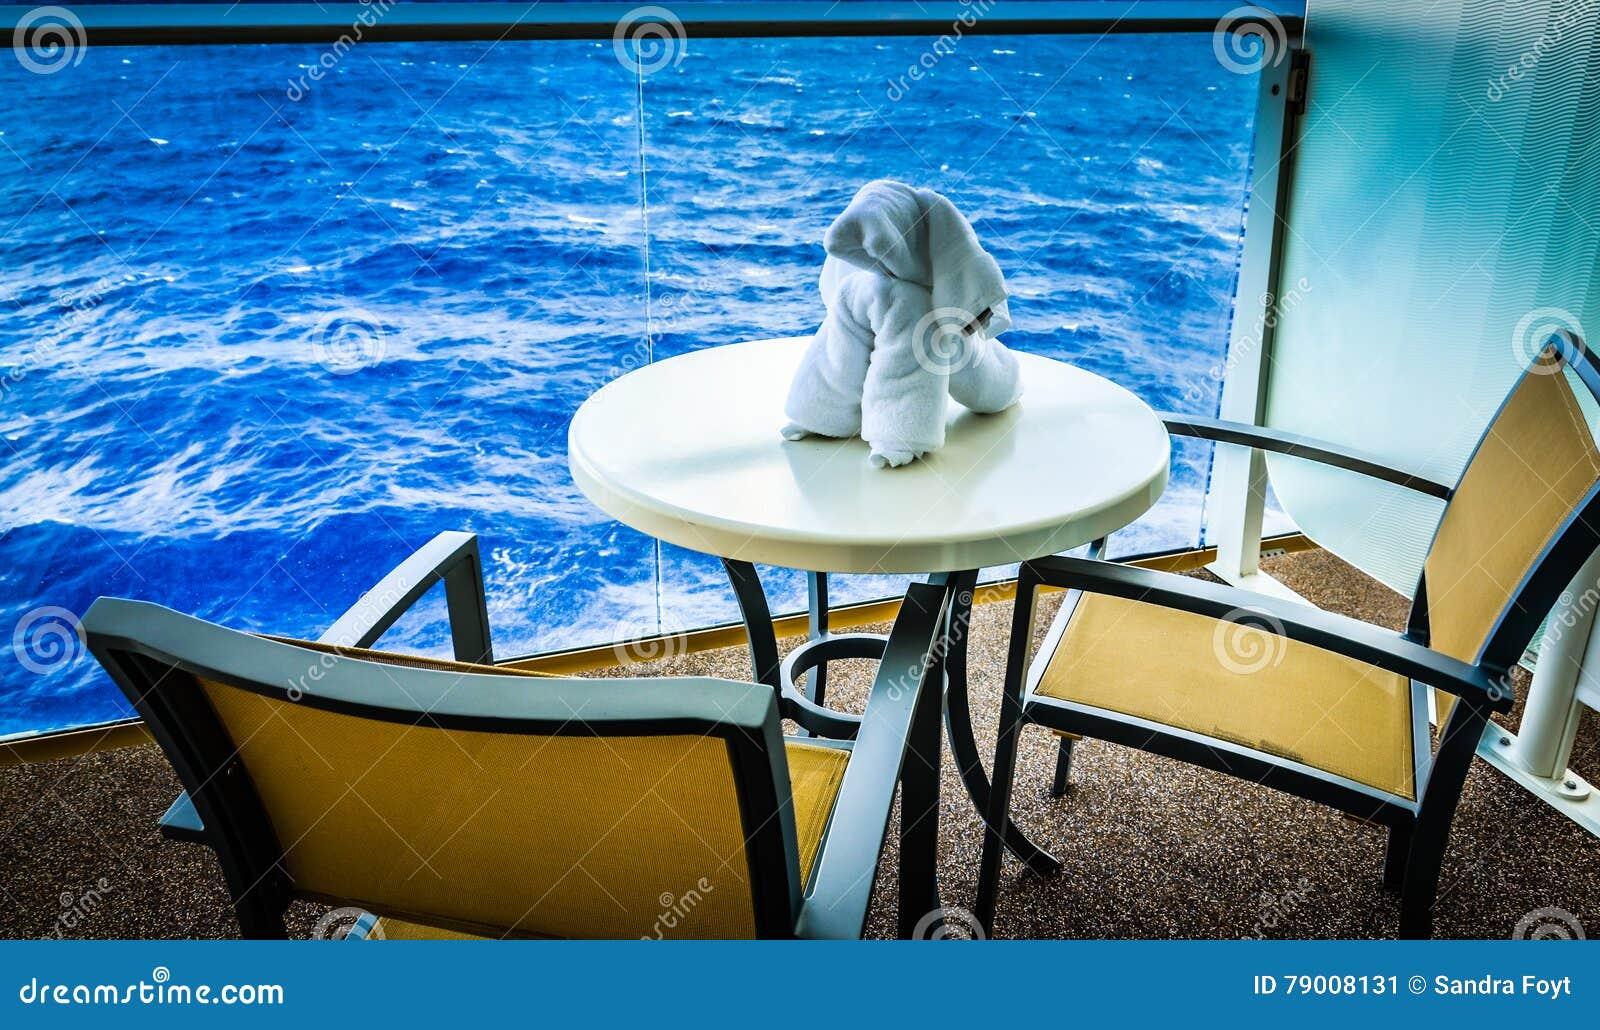 Towel Dog On Cruise Ship Balcony Stock Image Image Of Creature - Cruise ship pool table